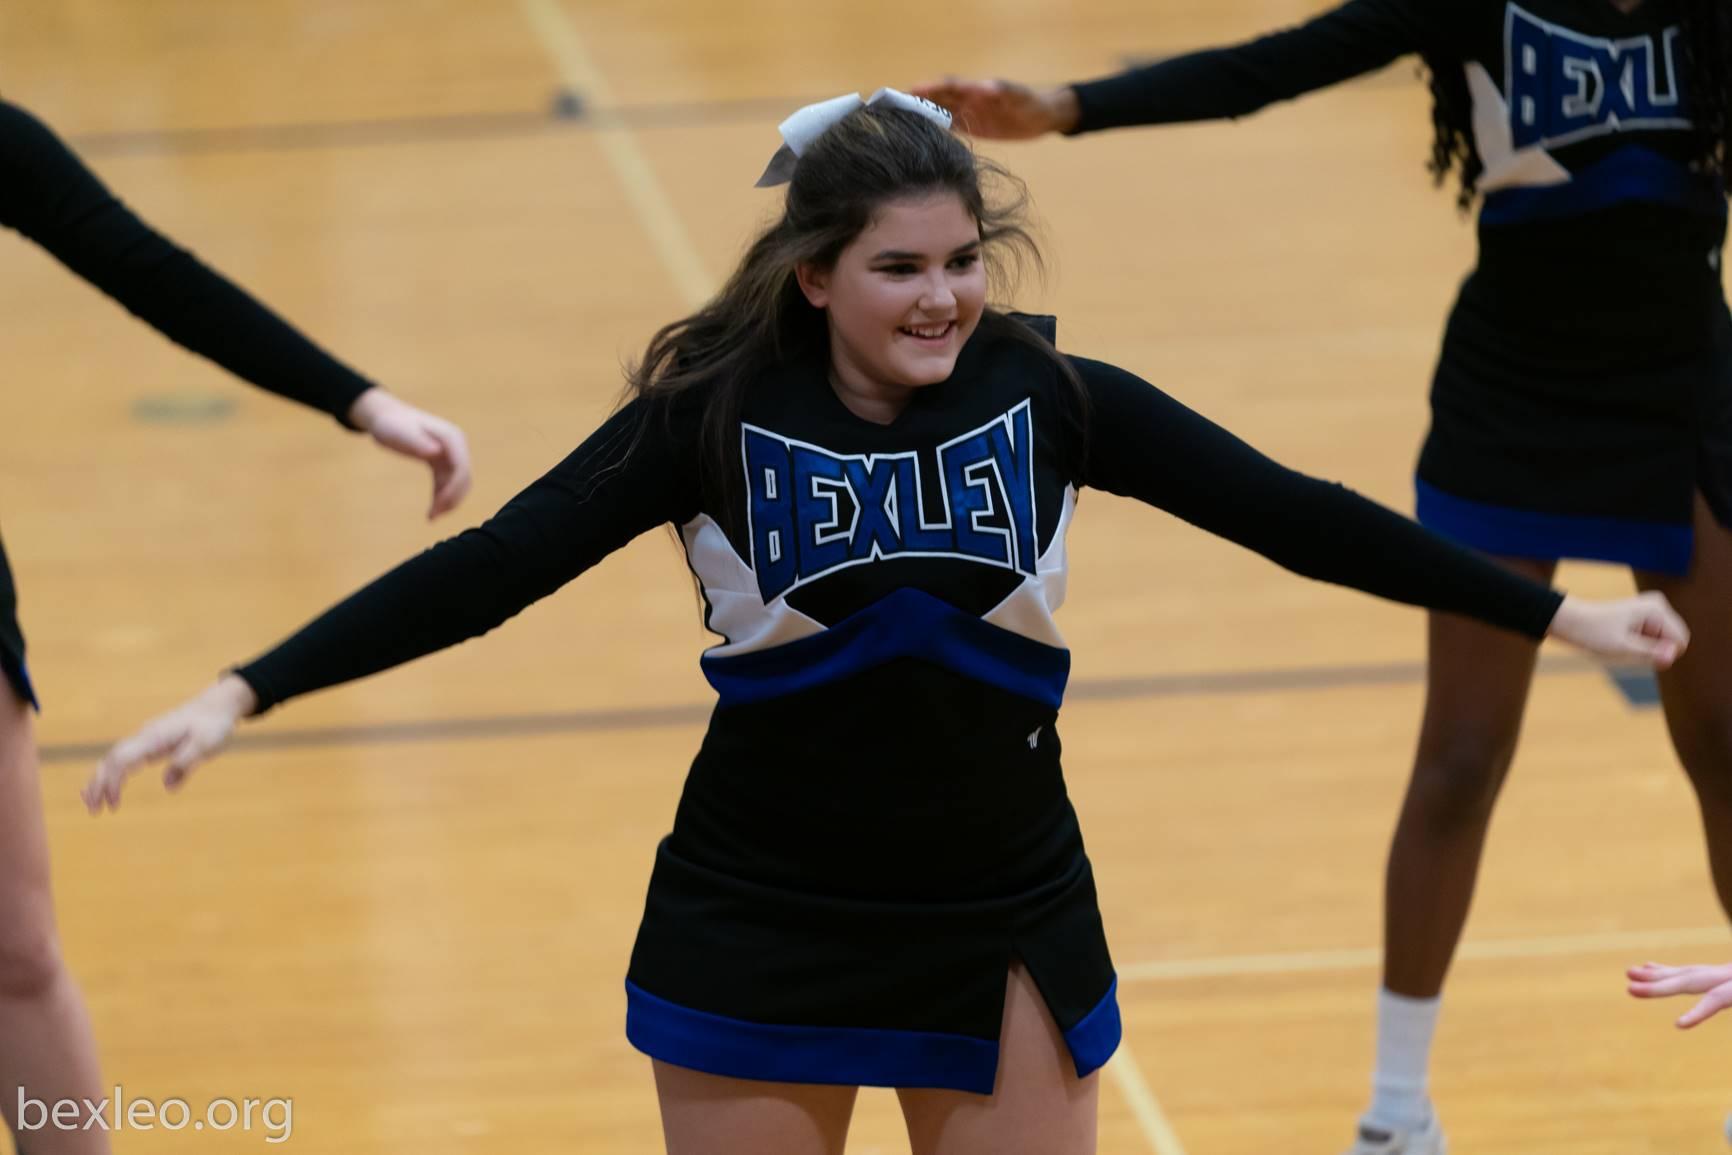 cheerleader cheering